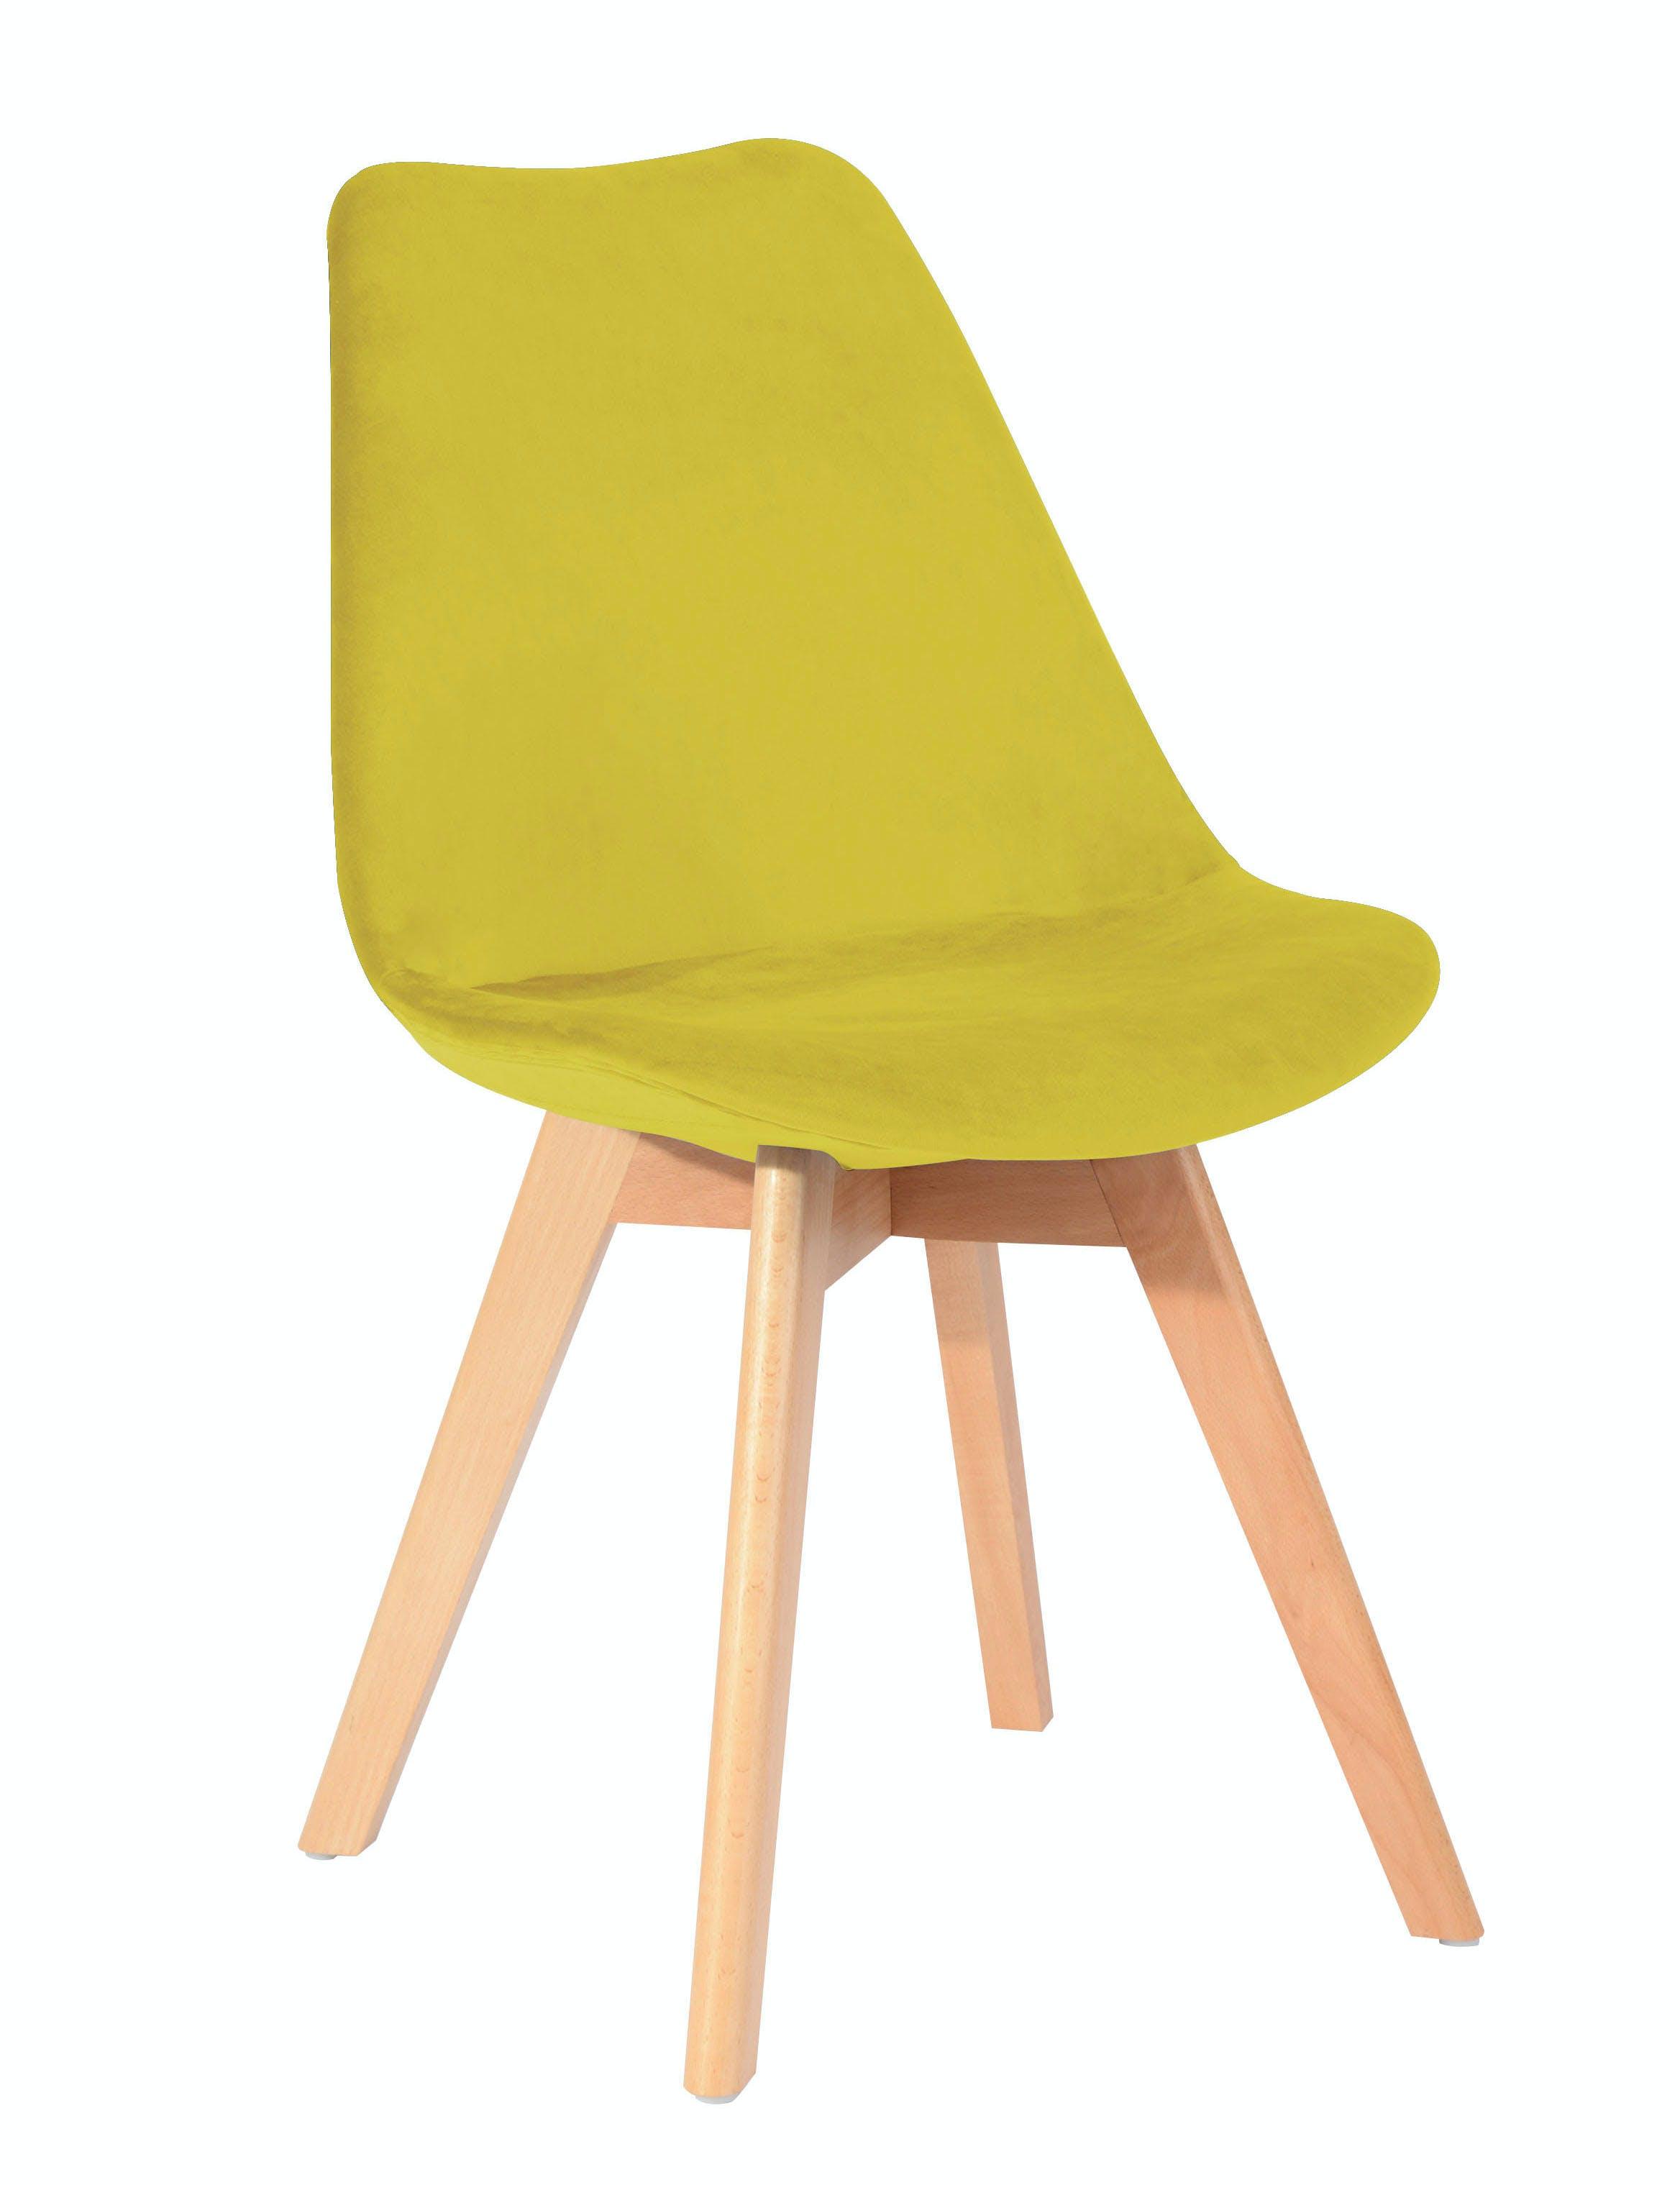 chaise scandinave en velours anis 49x53xh84cm stockholm